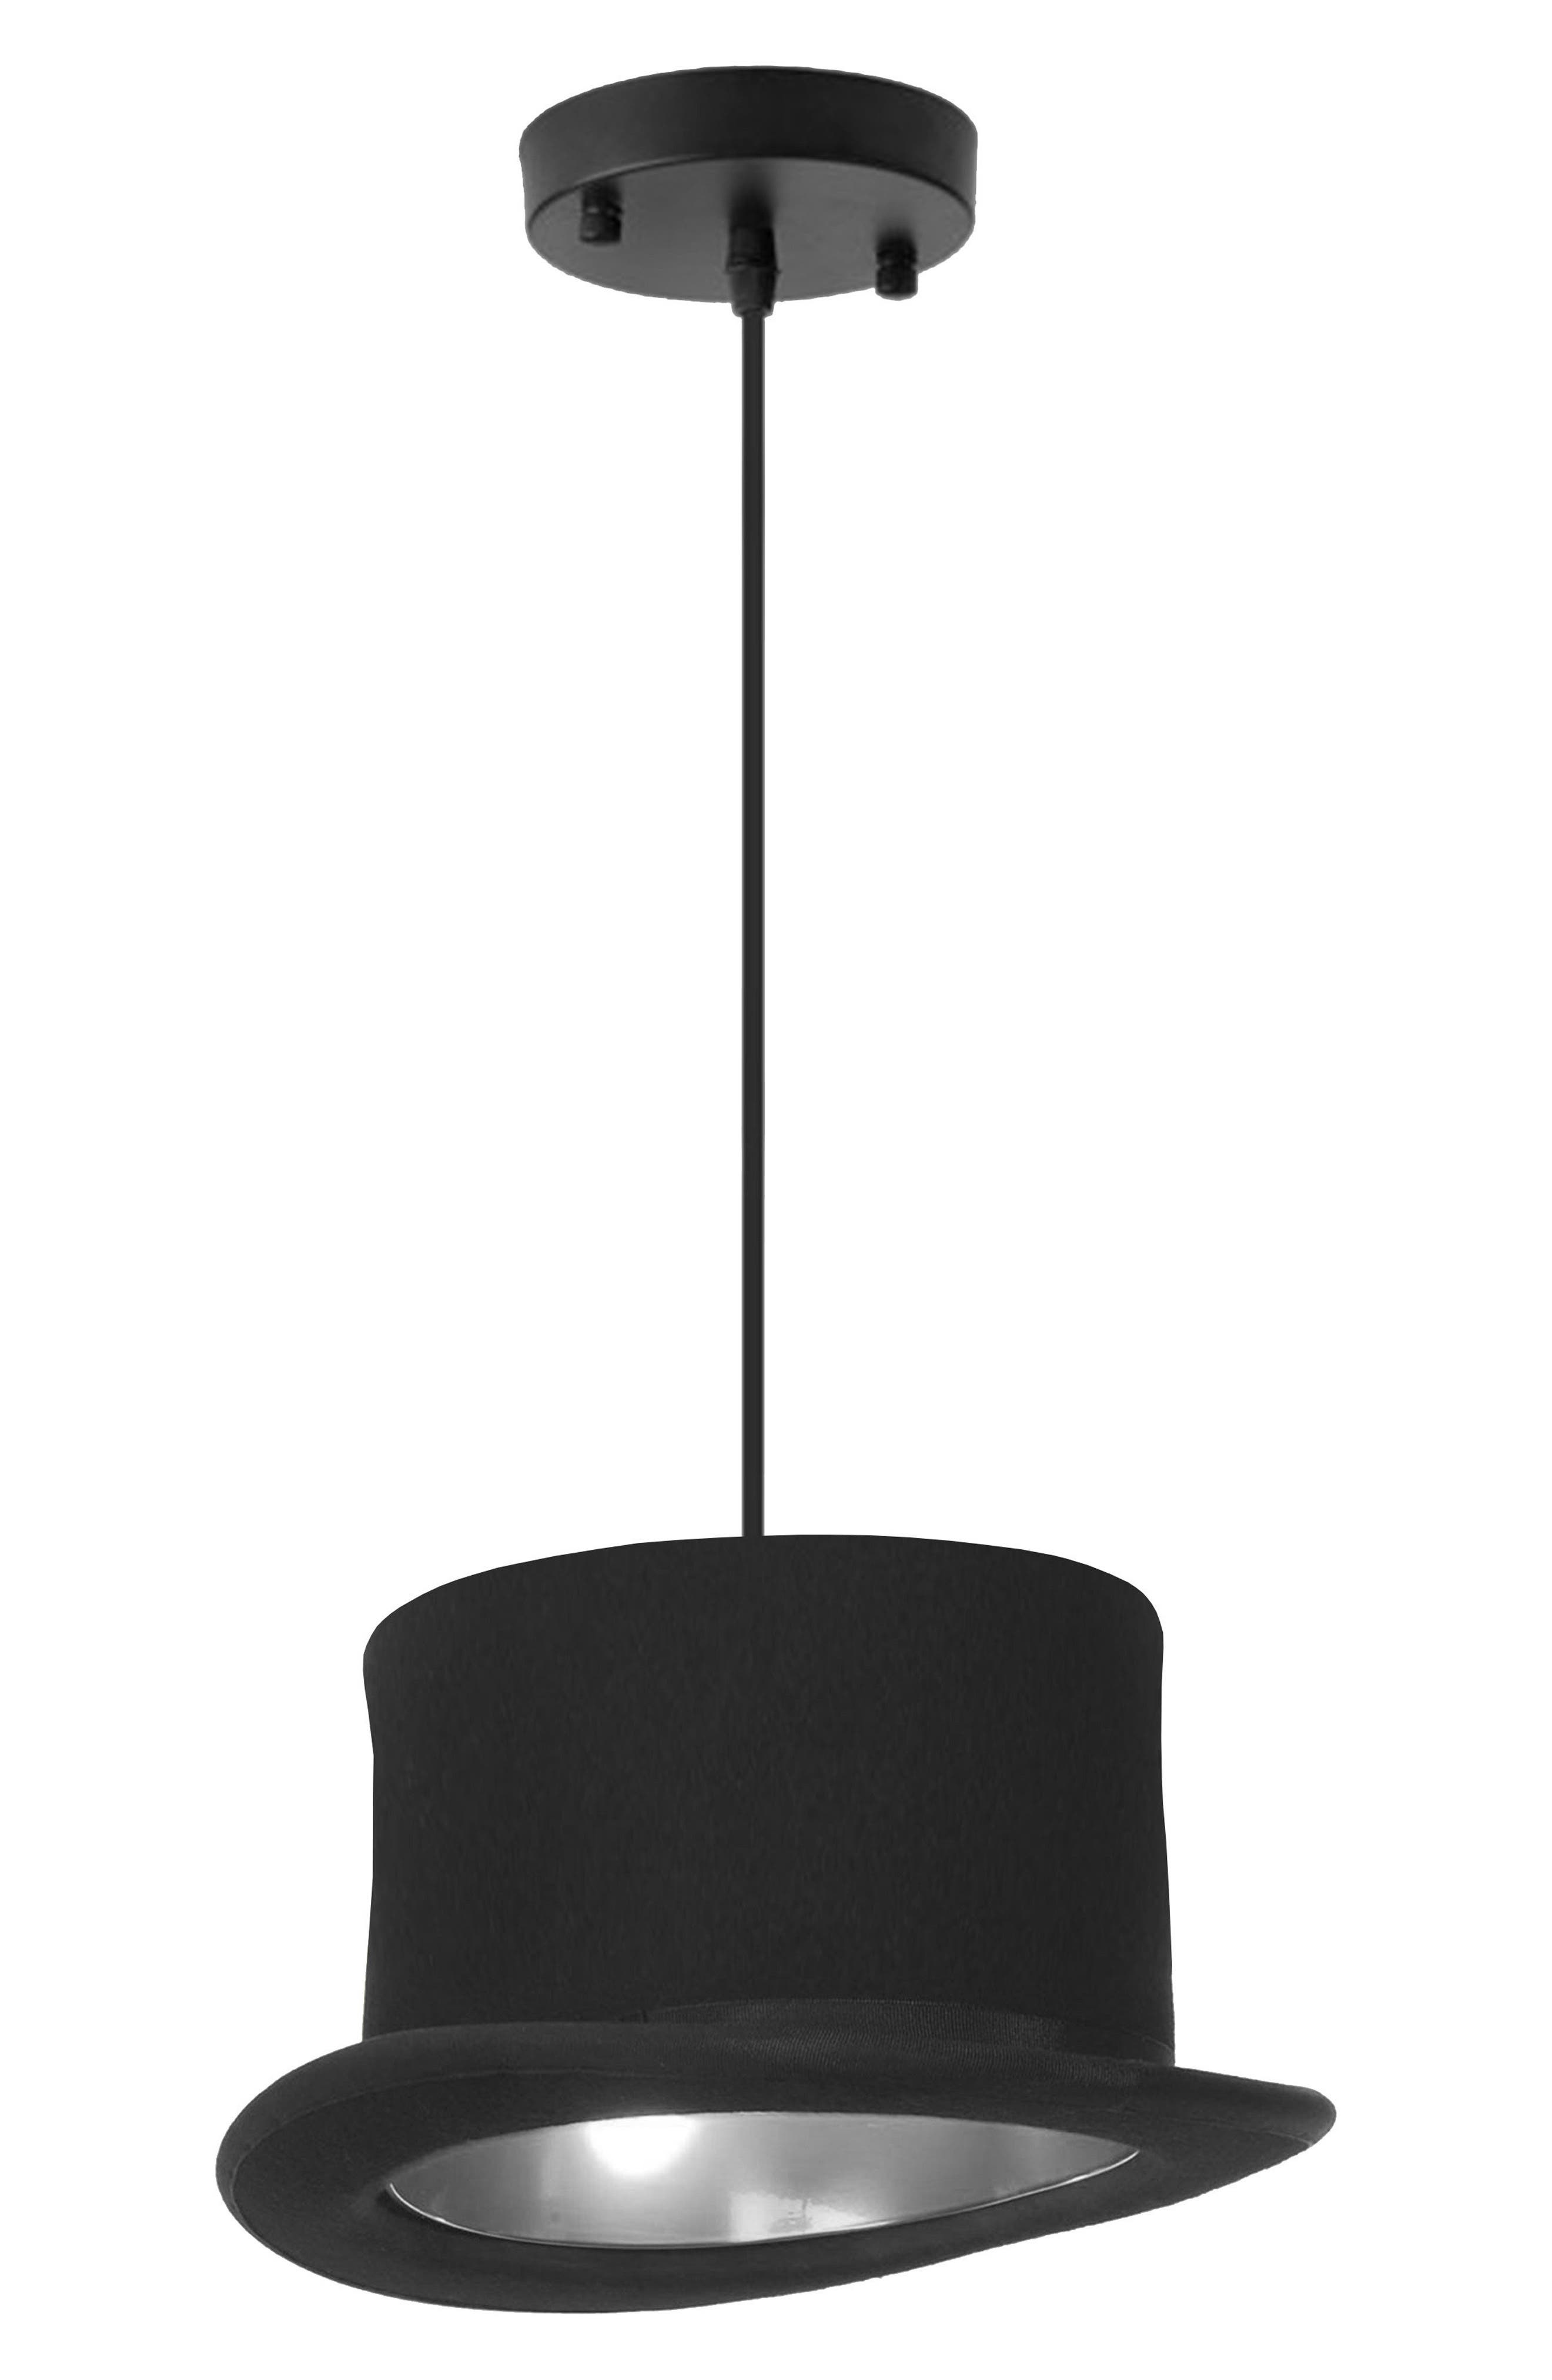 Langley Top Hat Ceiling Fixture,                             Main thumbnail 1, color,                             001